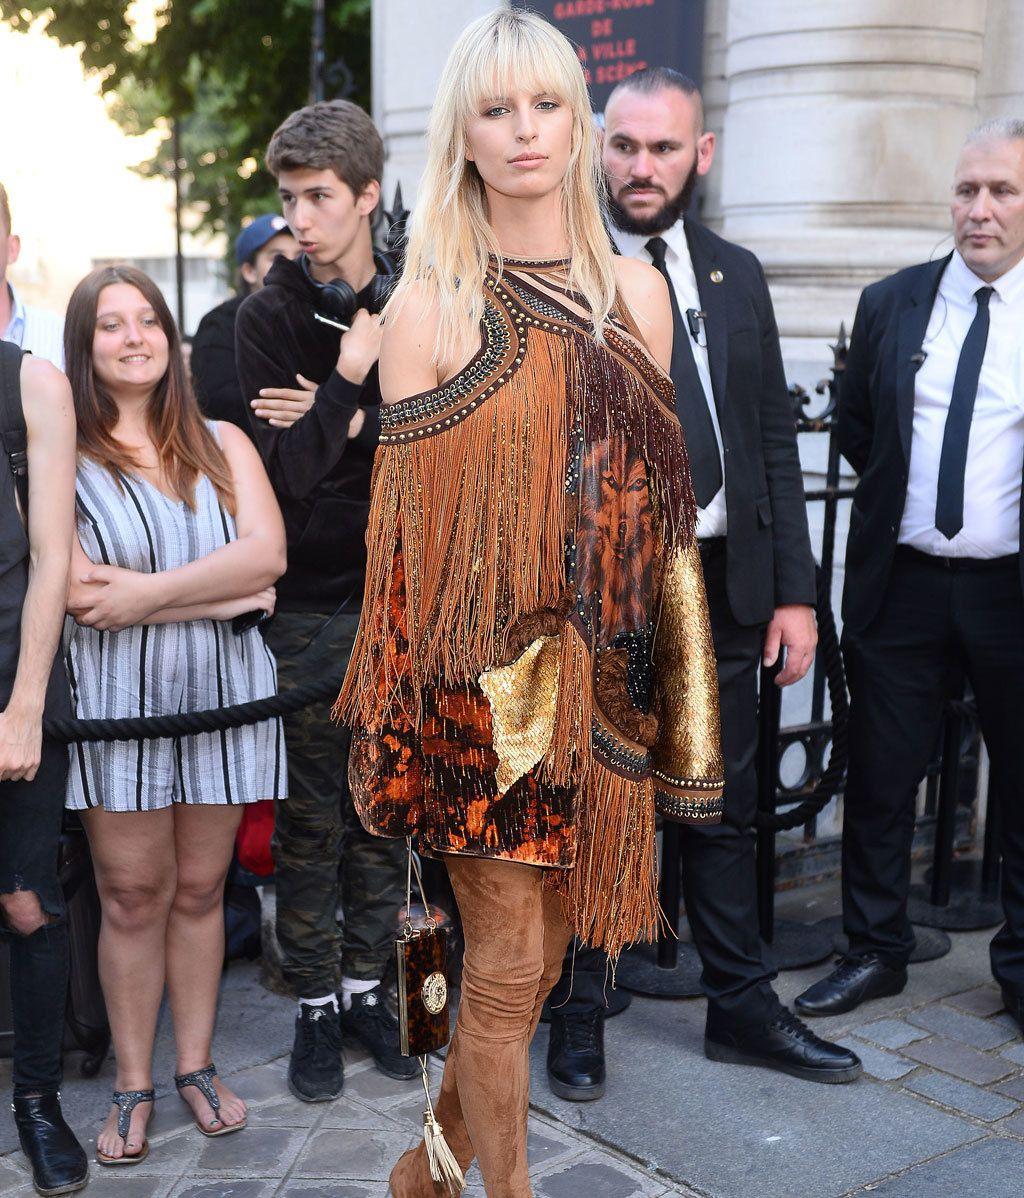 Karlie Kloss, Kate Moss y Kirsten Dunst: En la fiesta de Vogue triunfó el negro